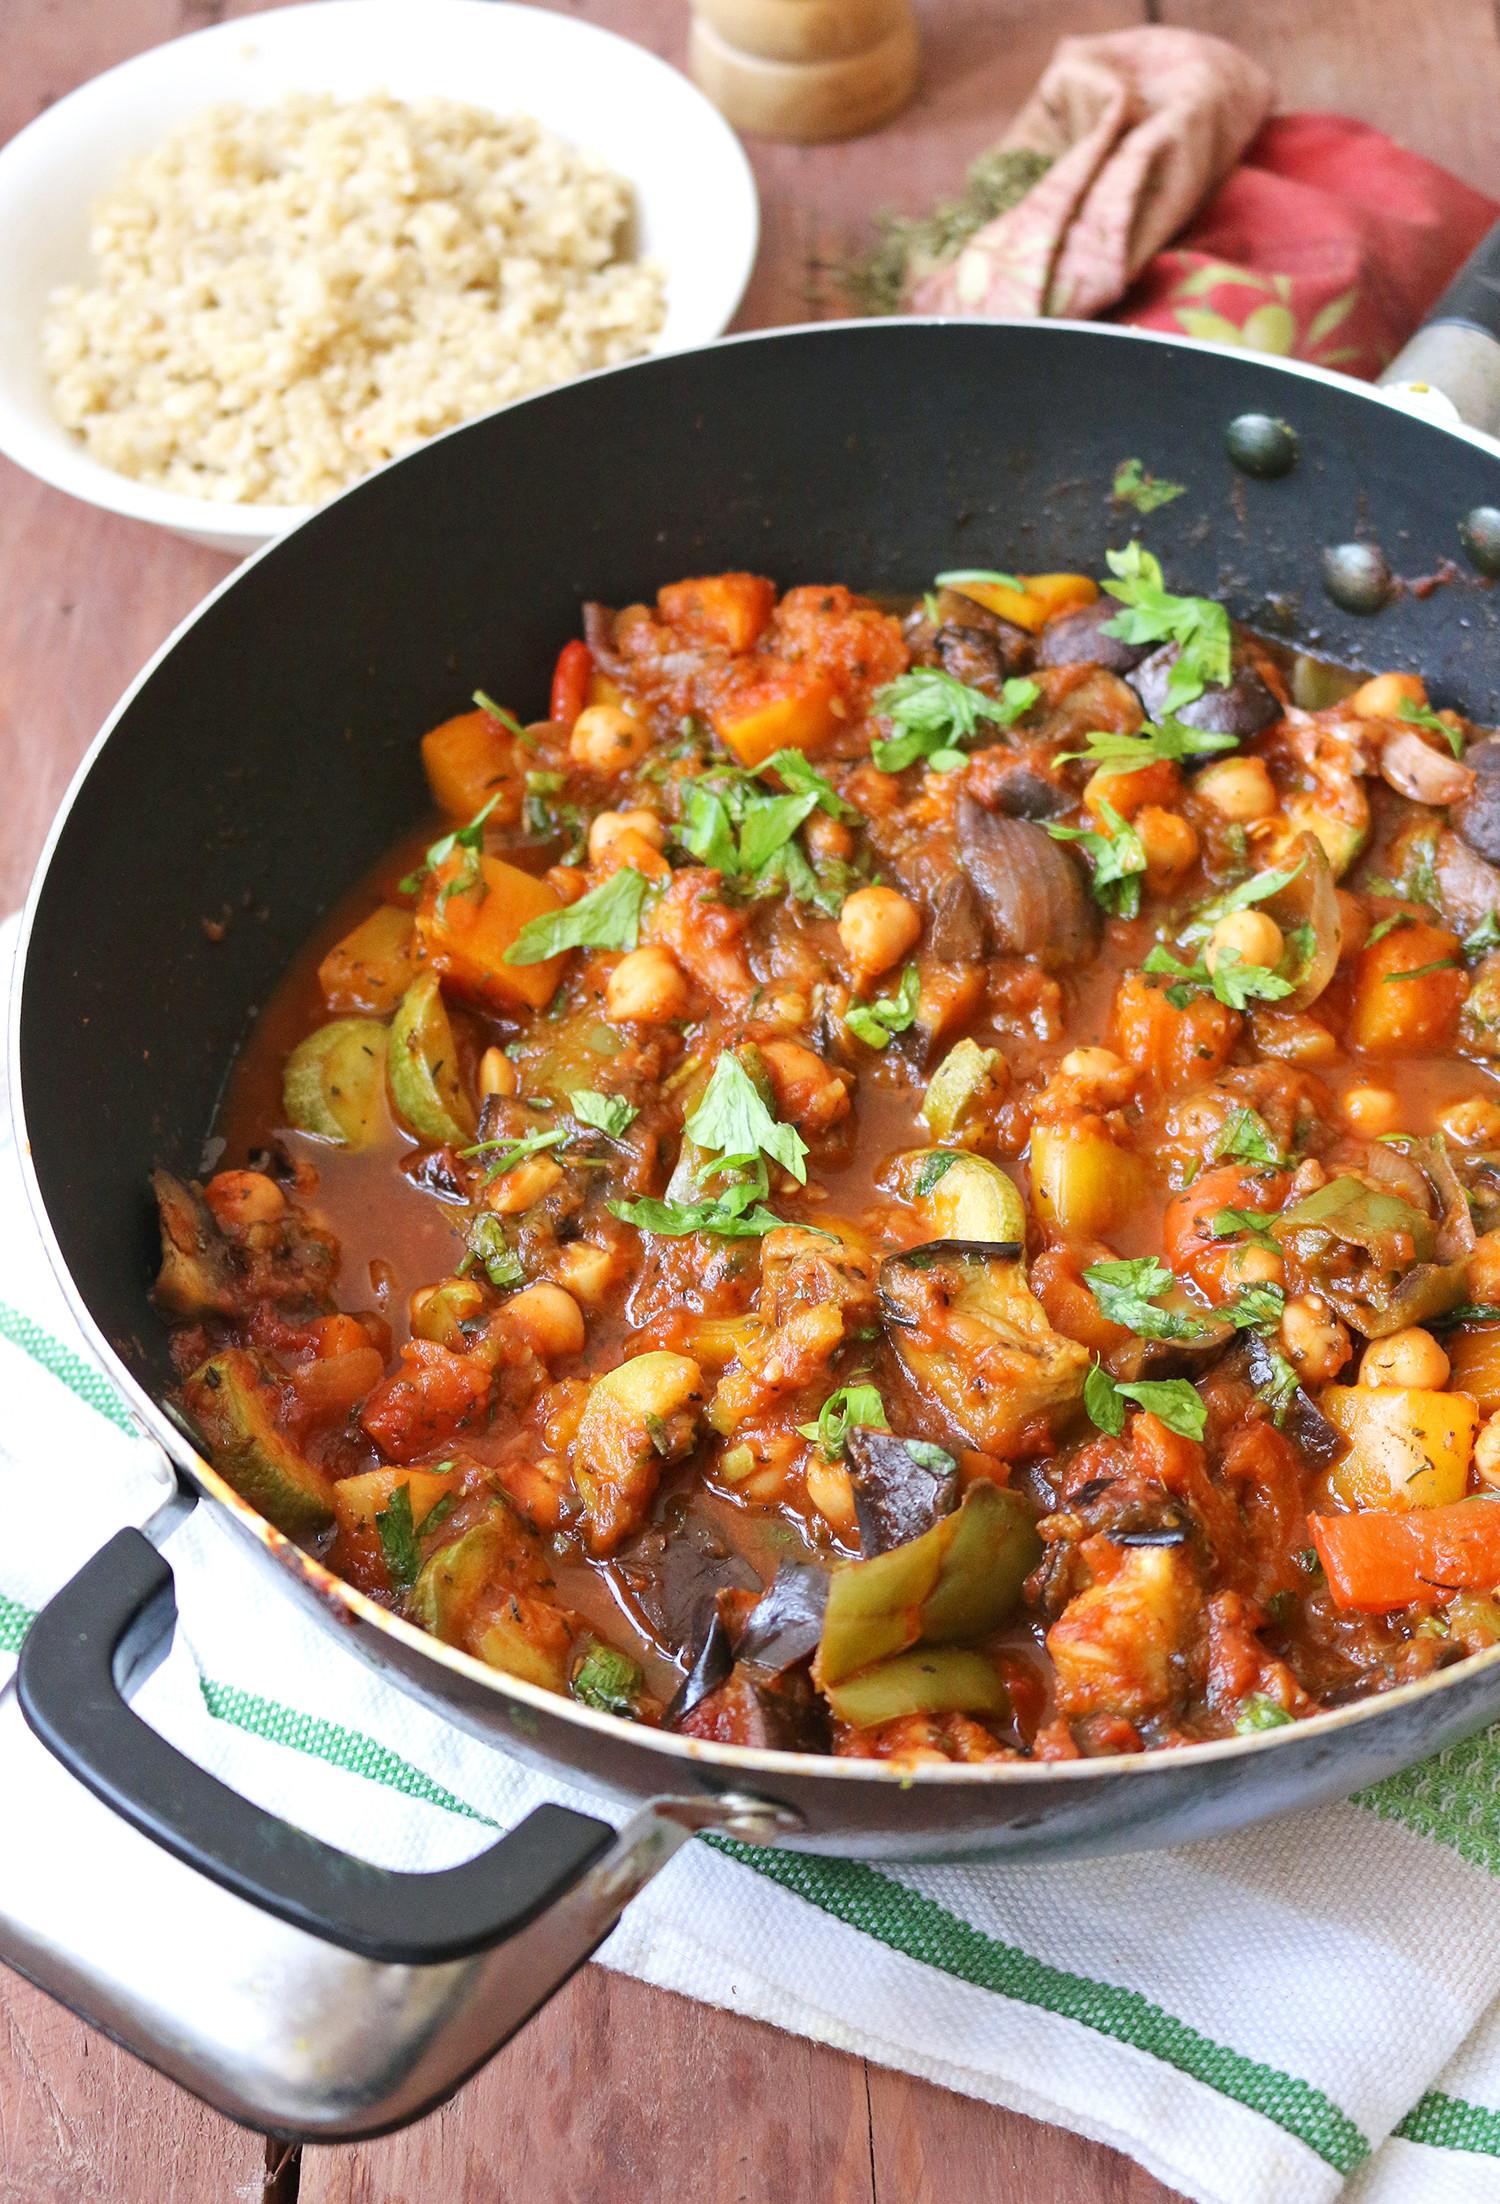 Vegetarian Mediterranean Recipes  Mediterranean Ve able and Chickpea Stew